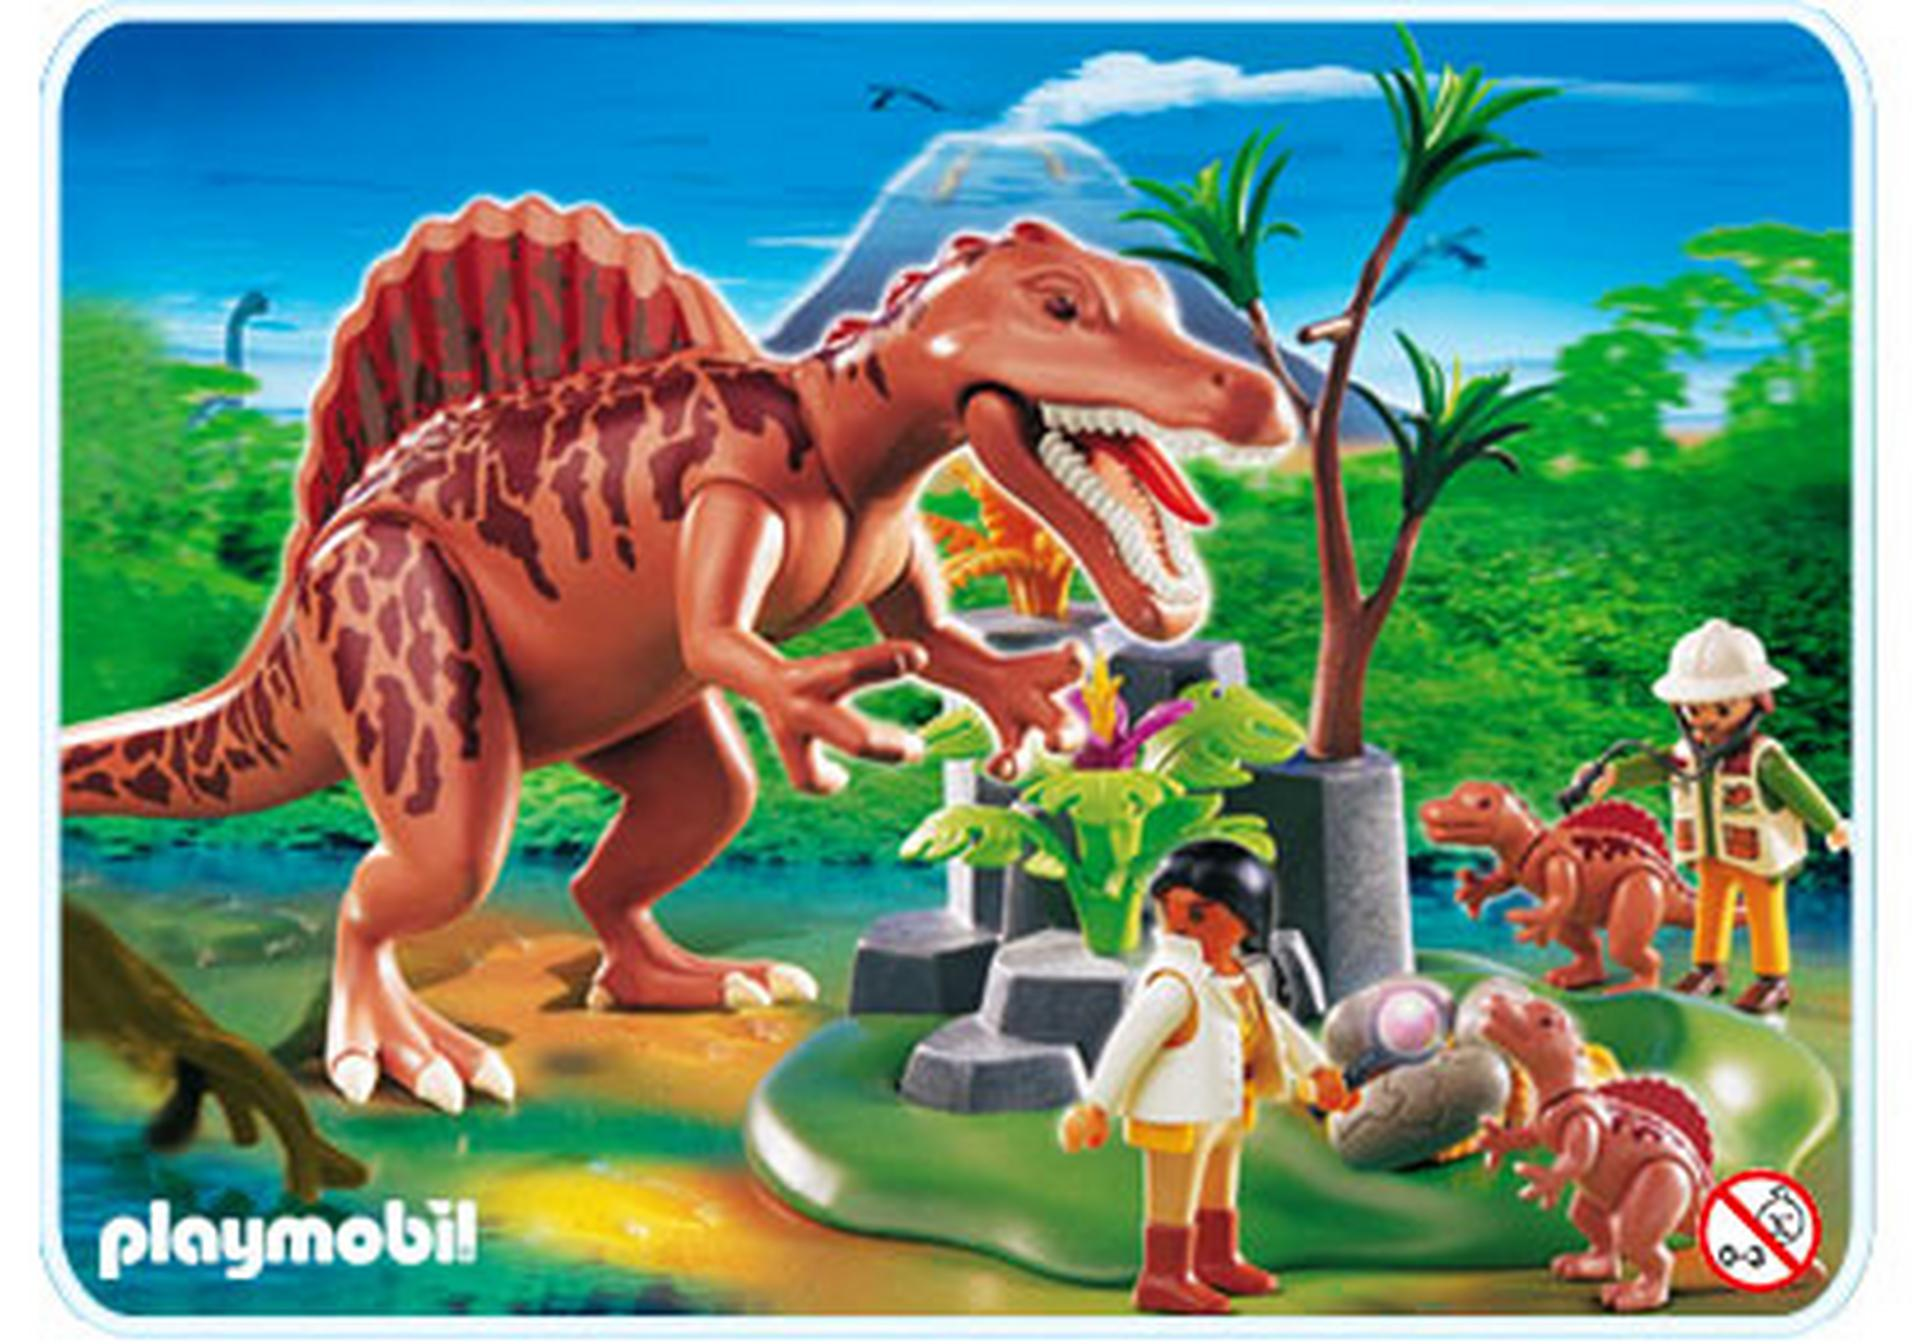 Spinosaurus mit dino nest 4174 a playmobil deutschland - Dinosaur playmobile ...